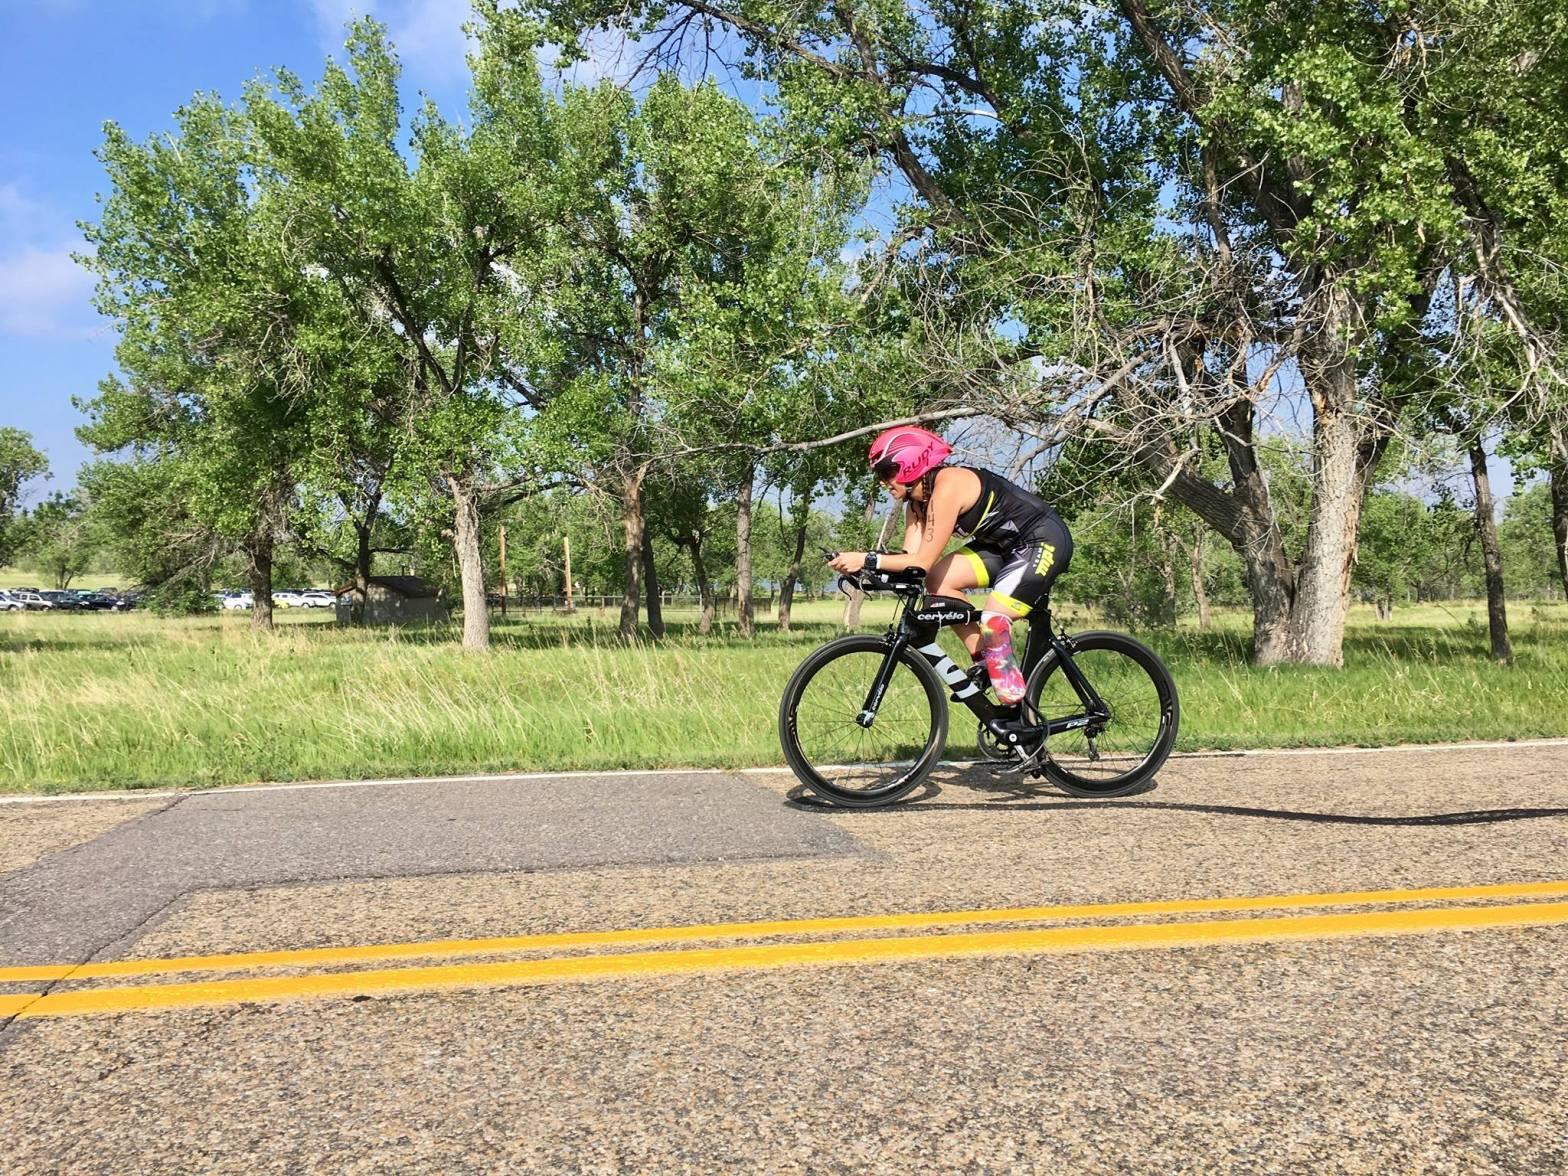 Riding my bike during a triathlon in 2017